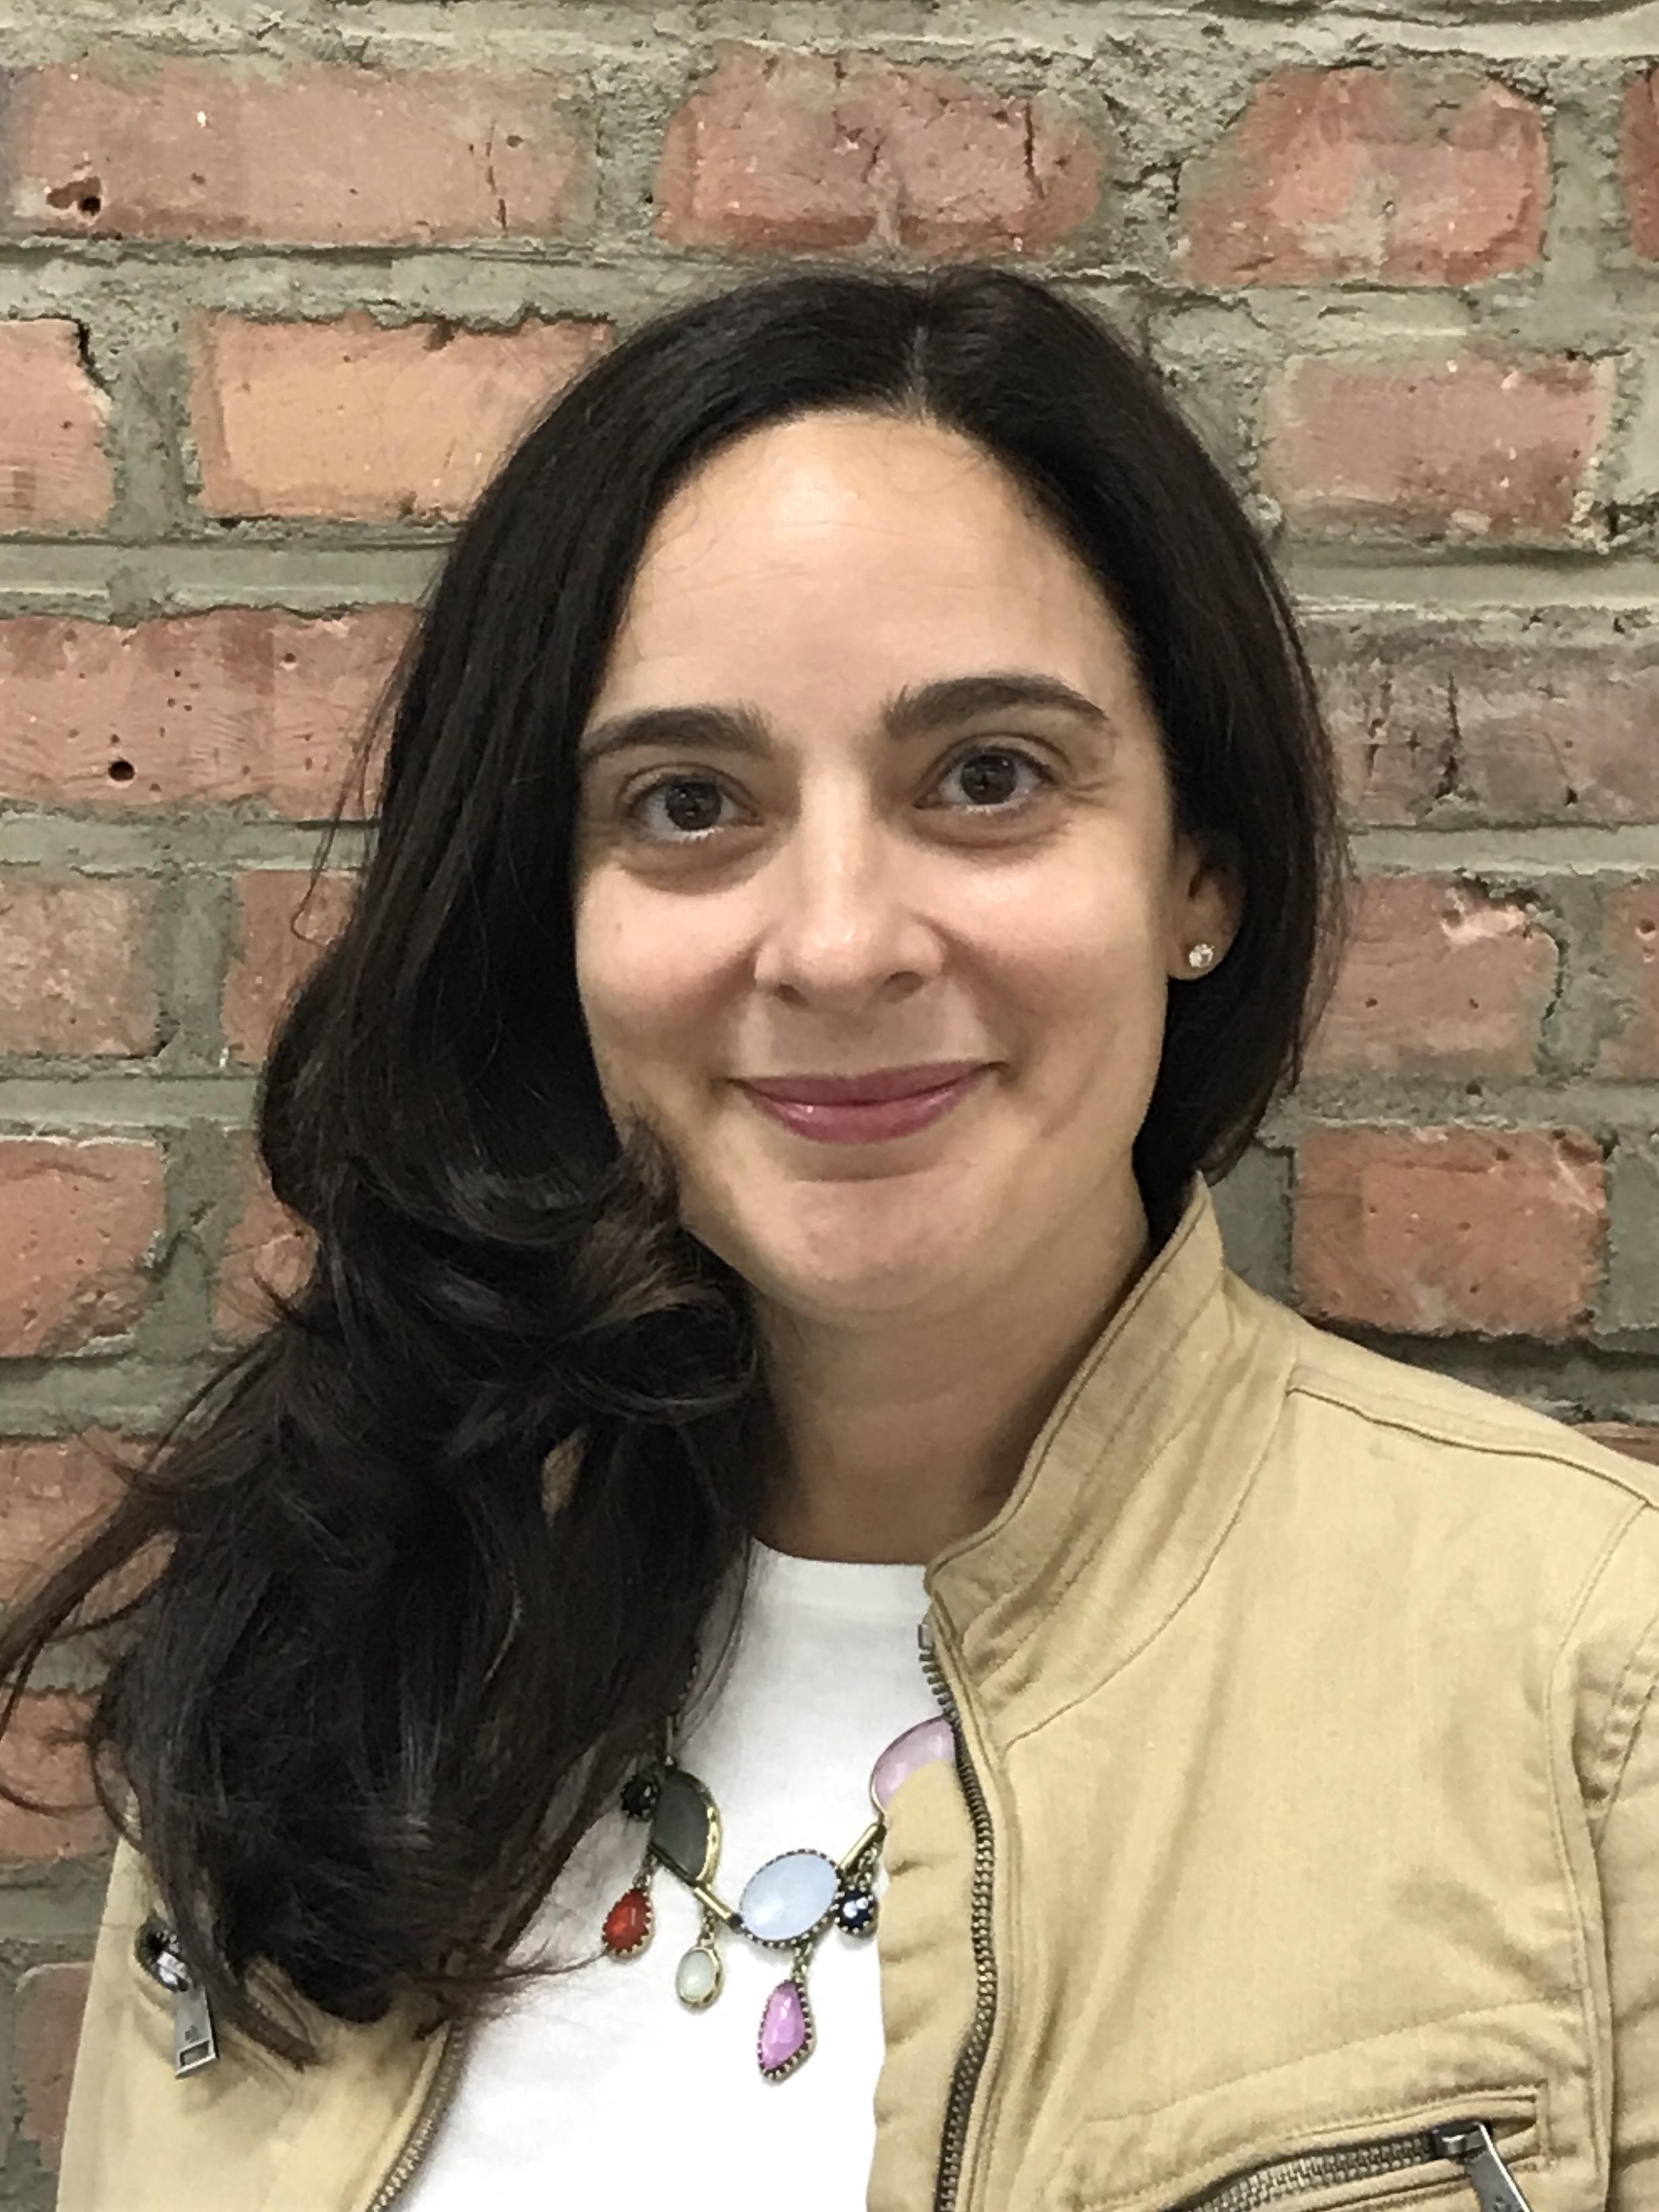 Heidi Greenberger